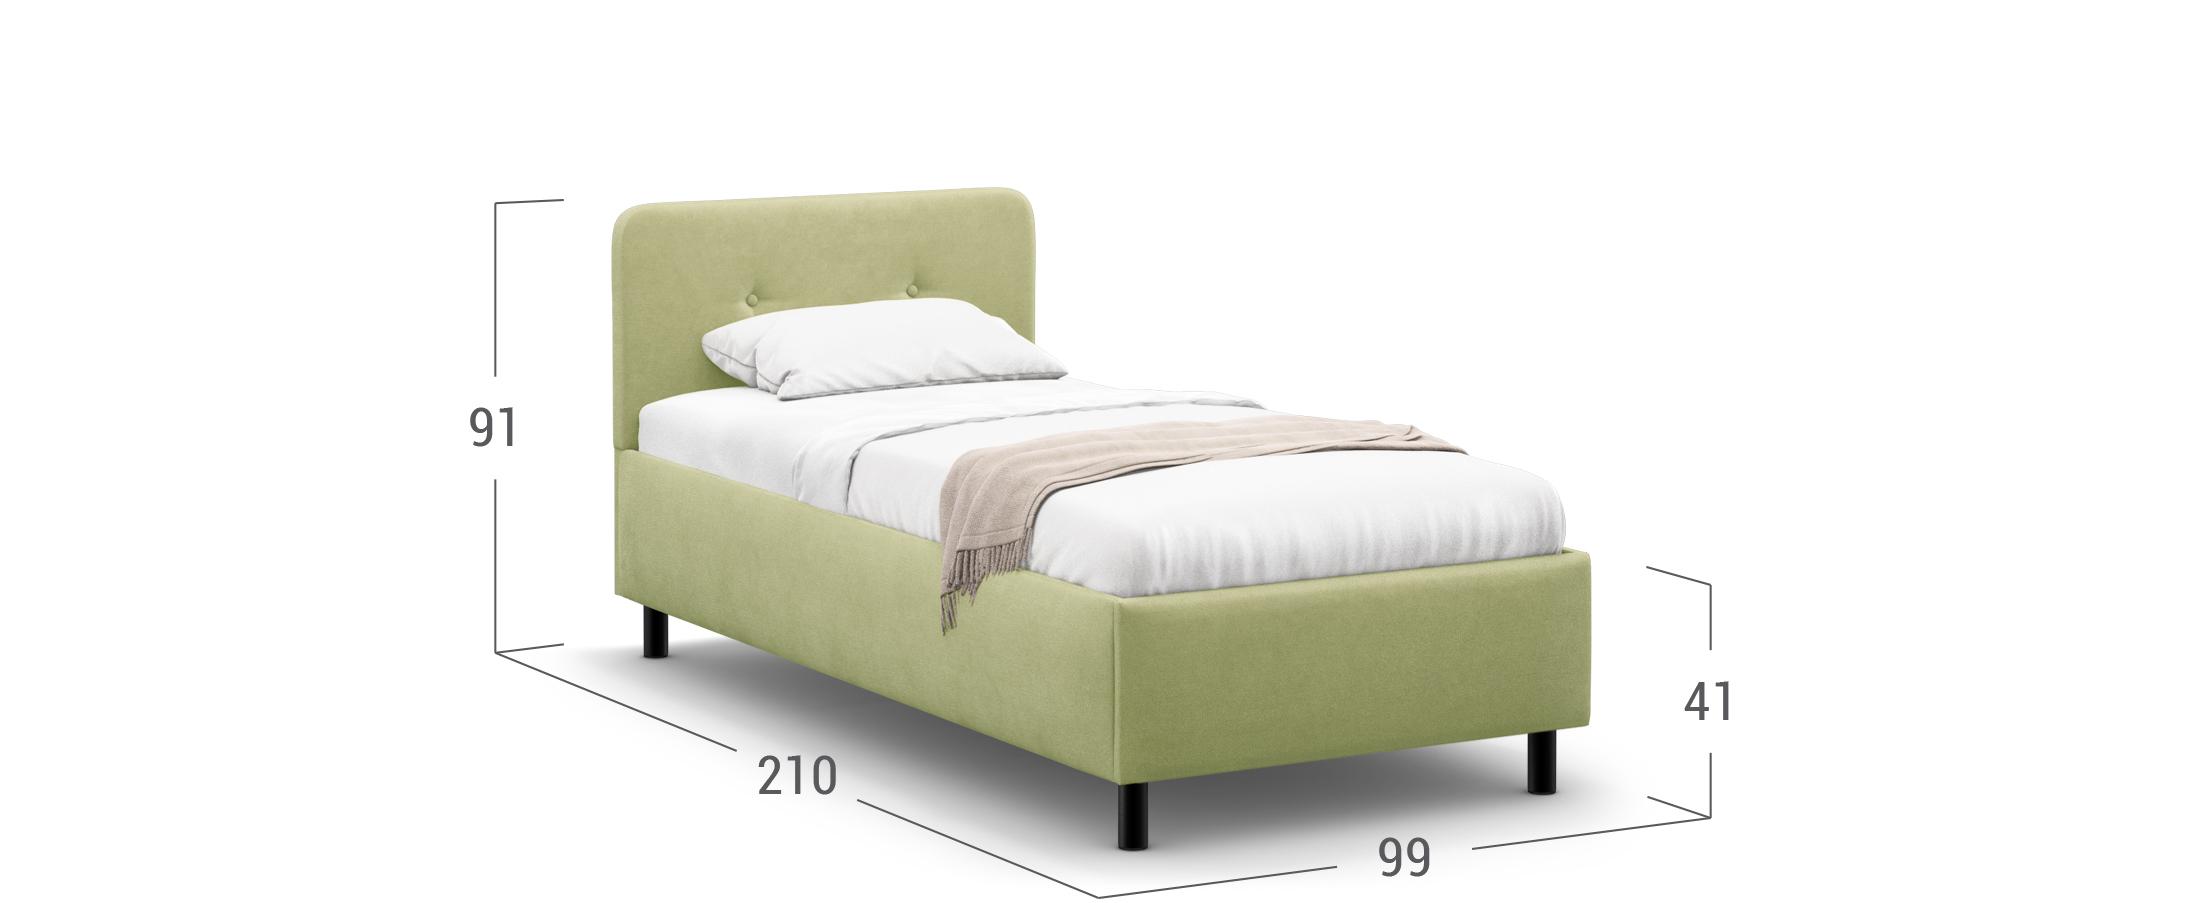 Кровать односпальная MOON FAMILY 1232 90х200